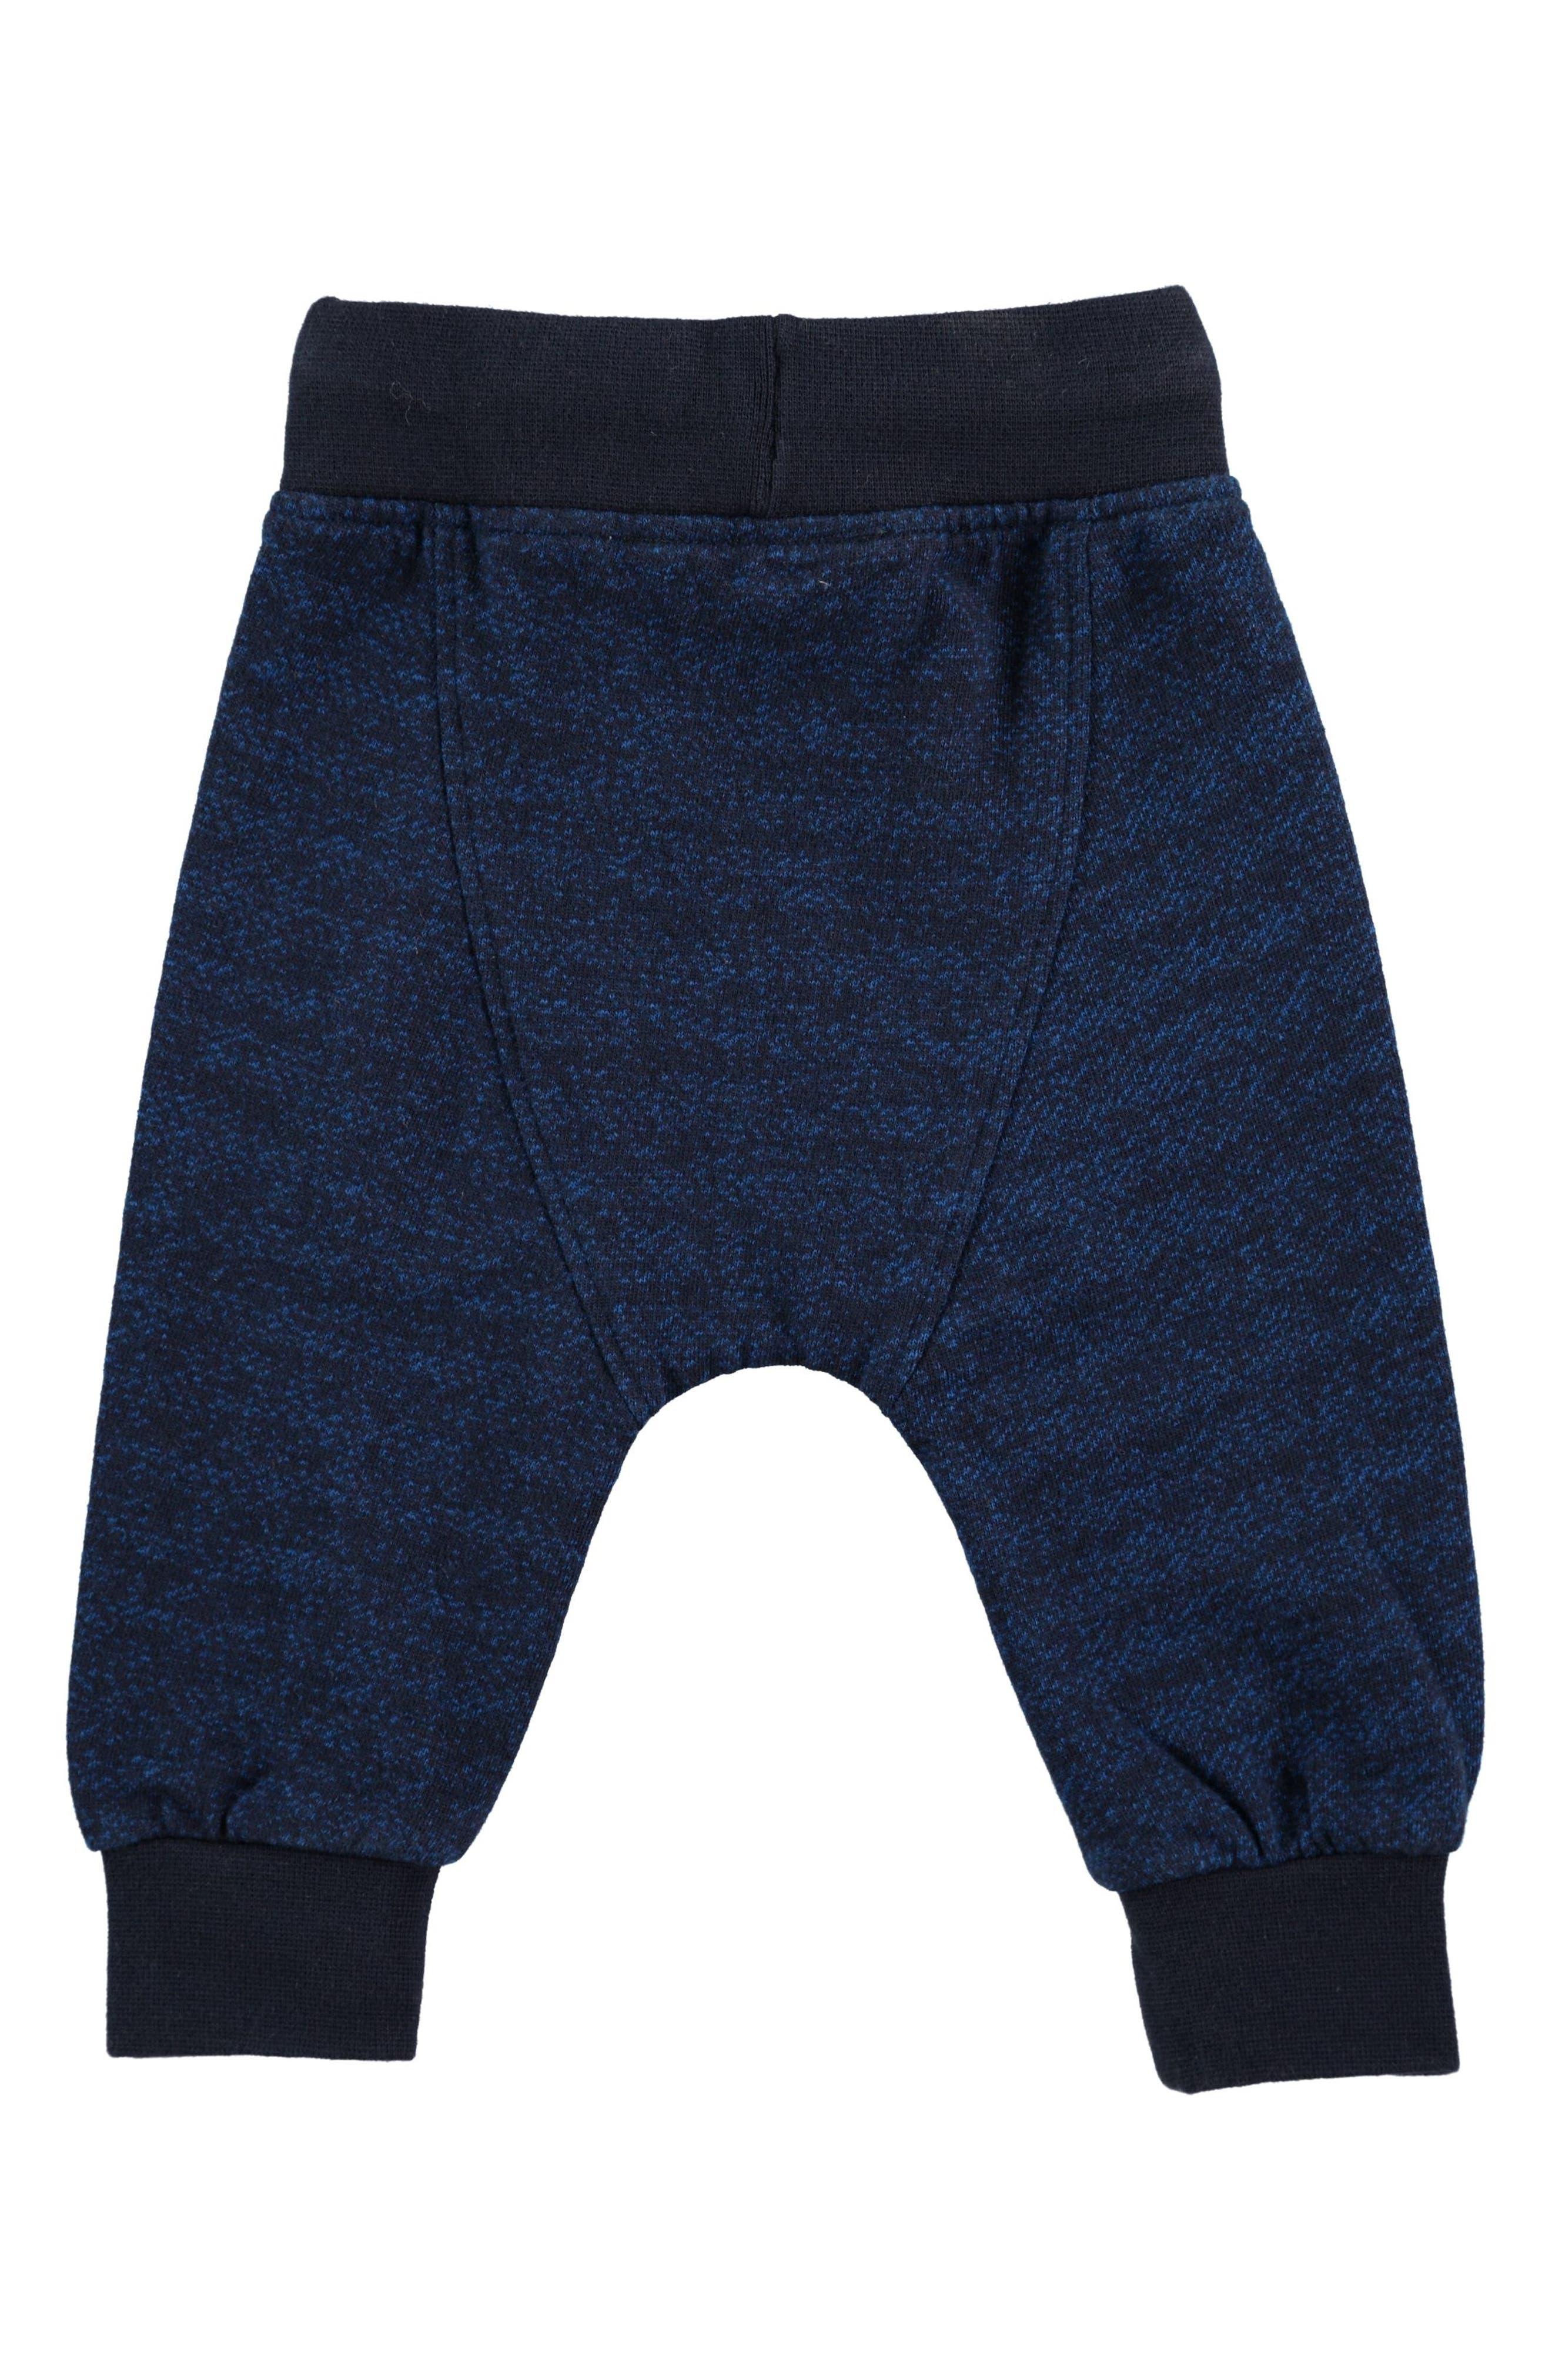 Sting Jogger Pants,                             Alternate thumbnail 2, color,                             Navy Blazer